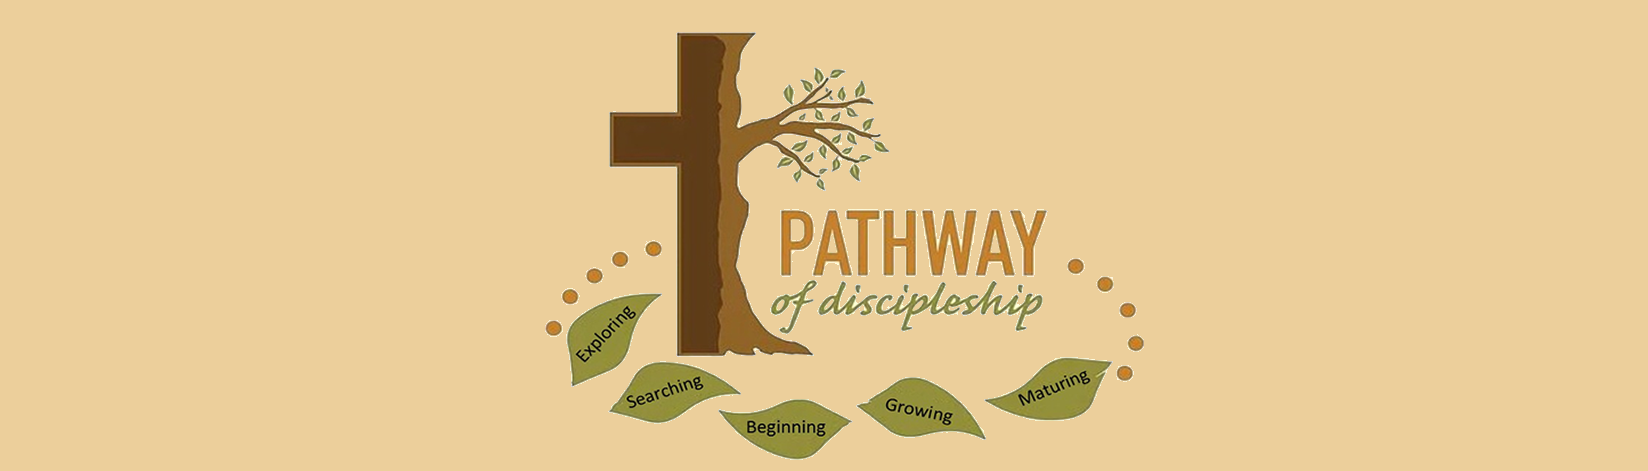 Pathway of Discipleship